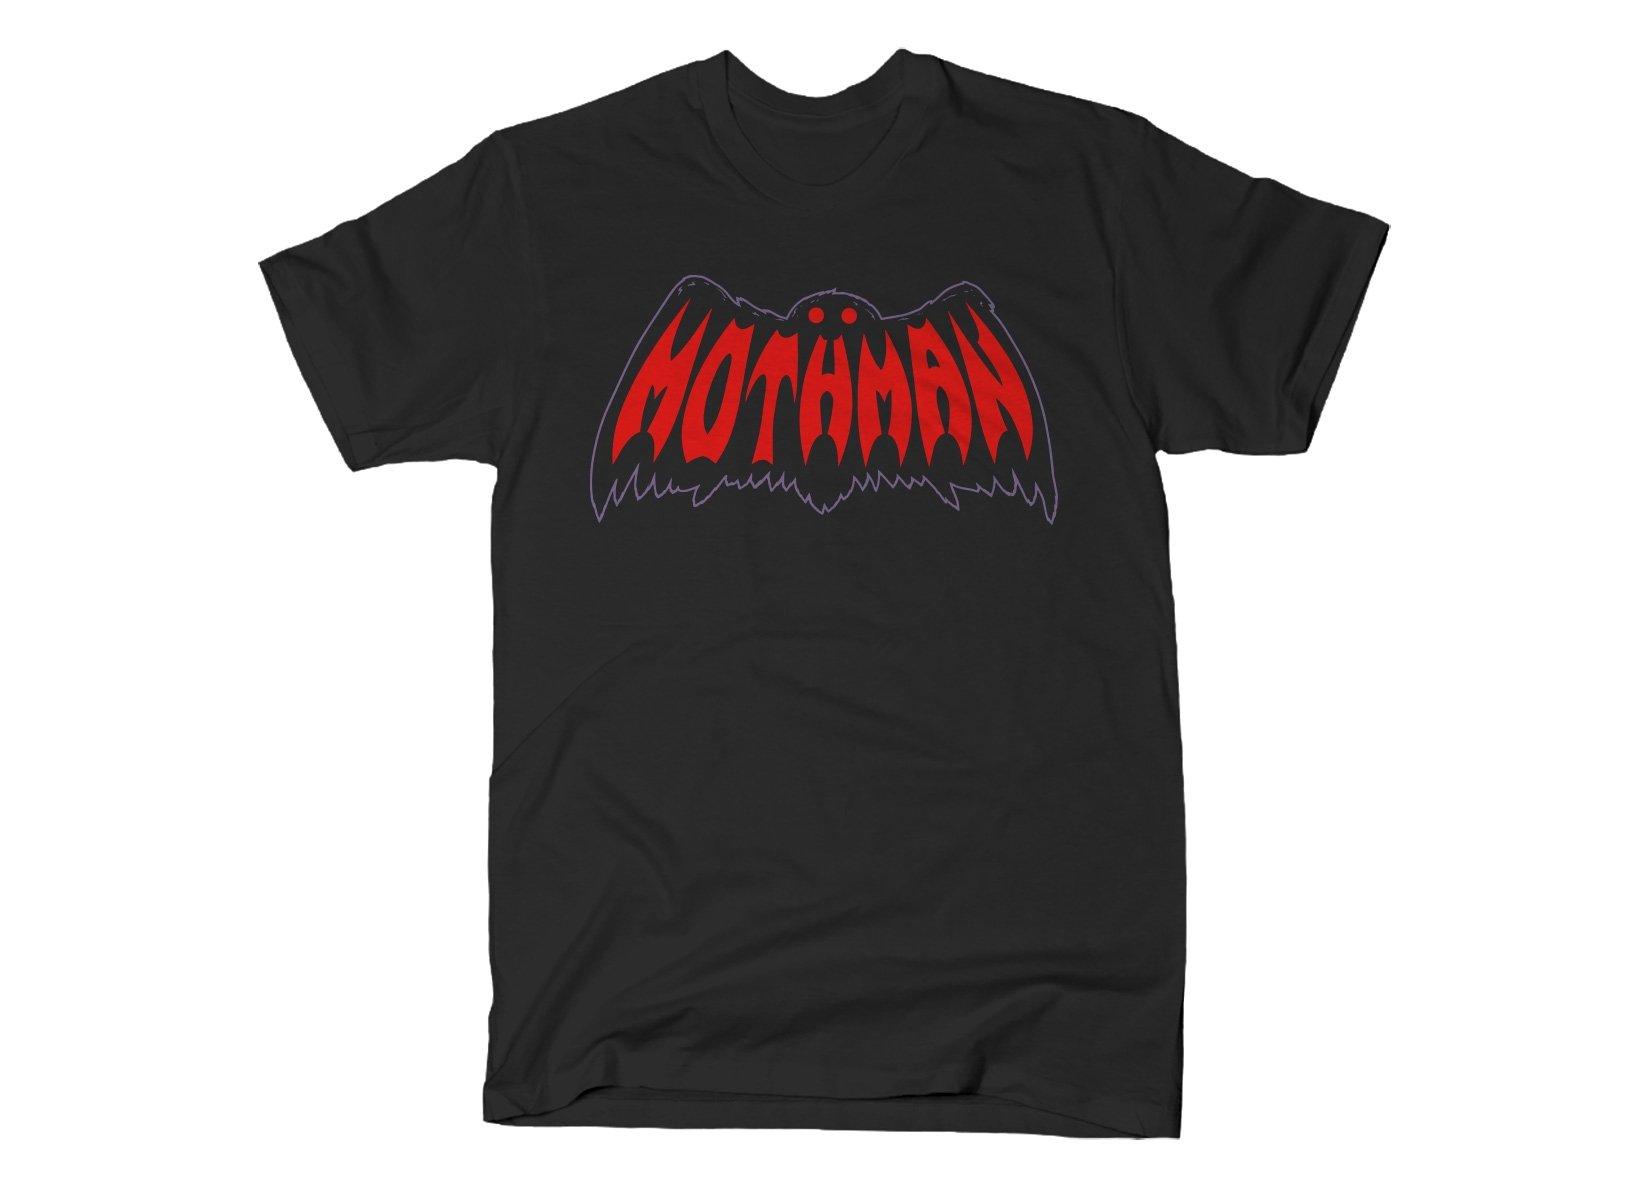 Mothman on Mens T-Shirt